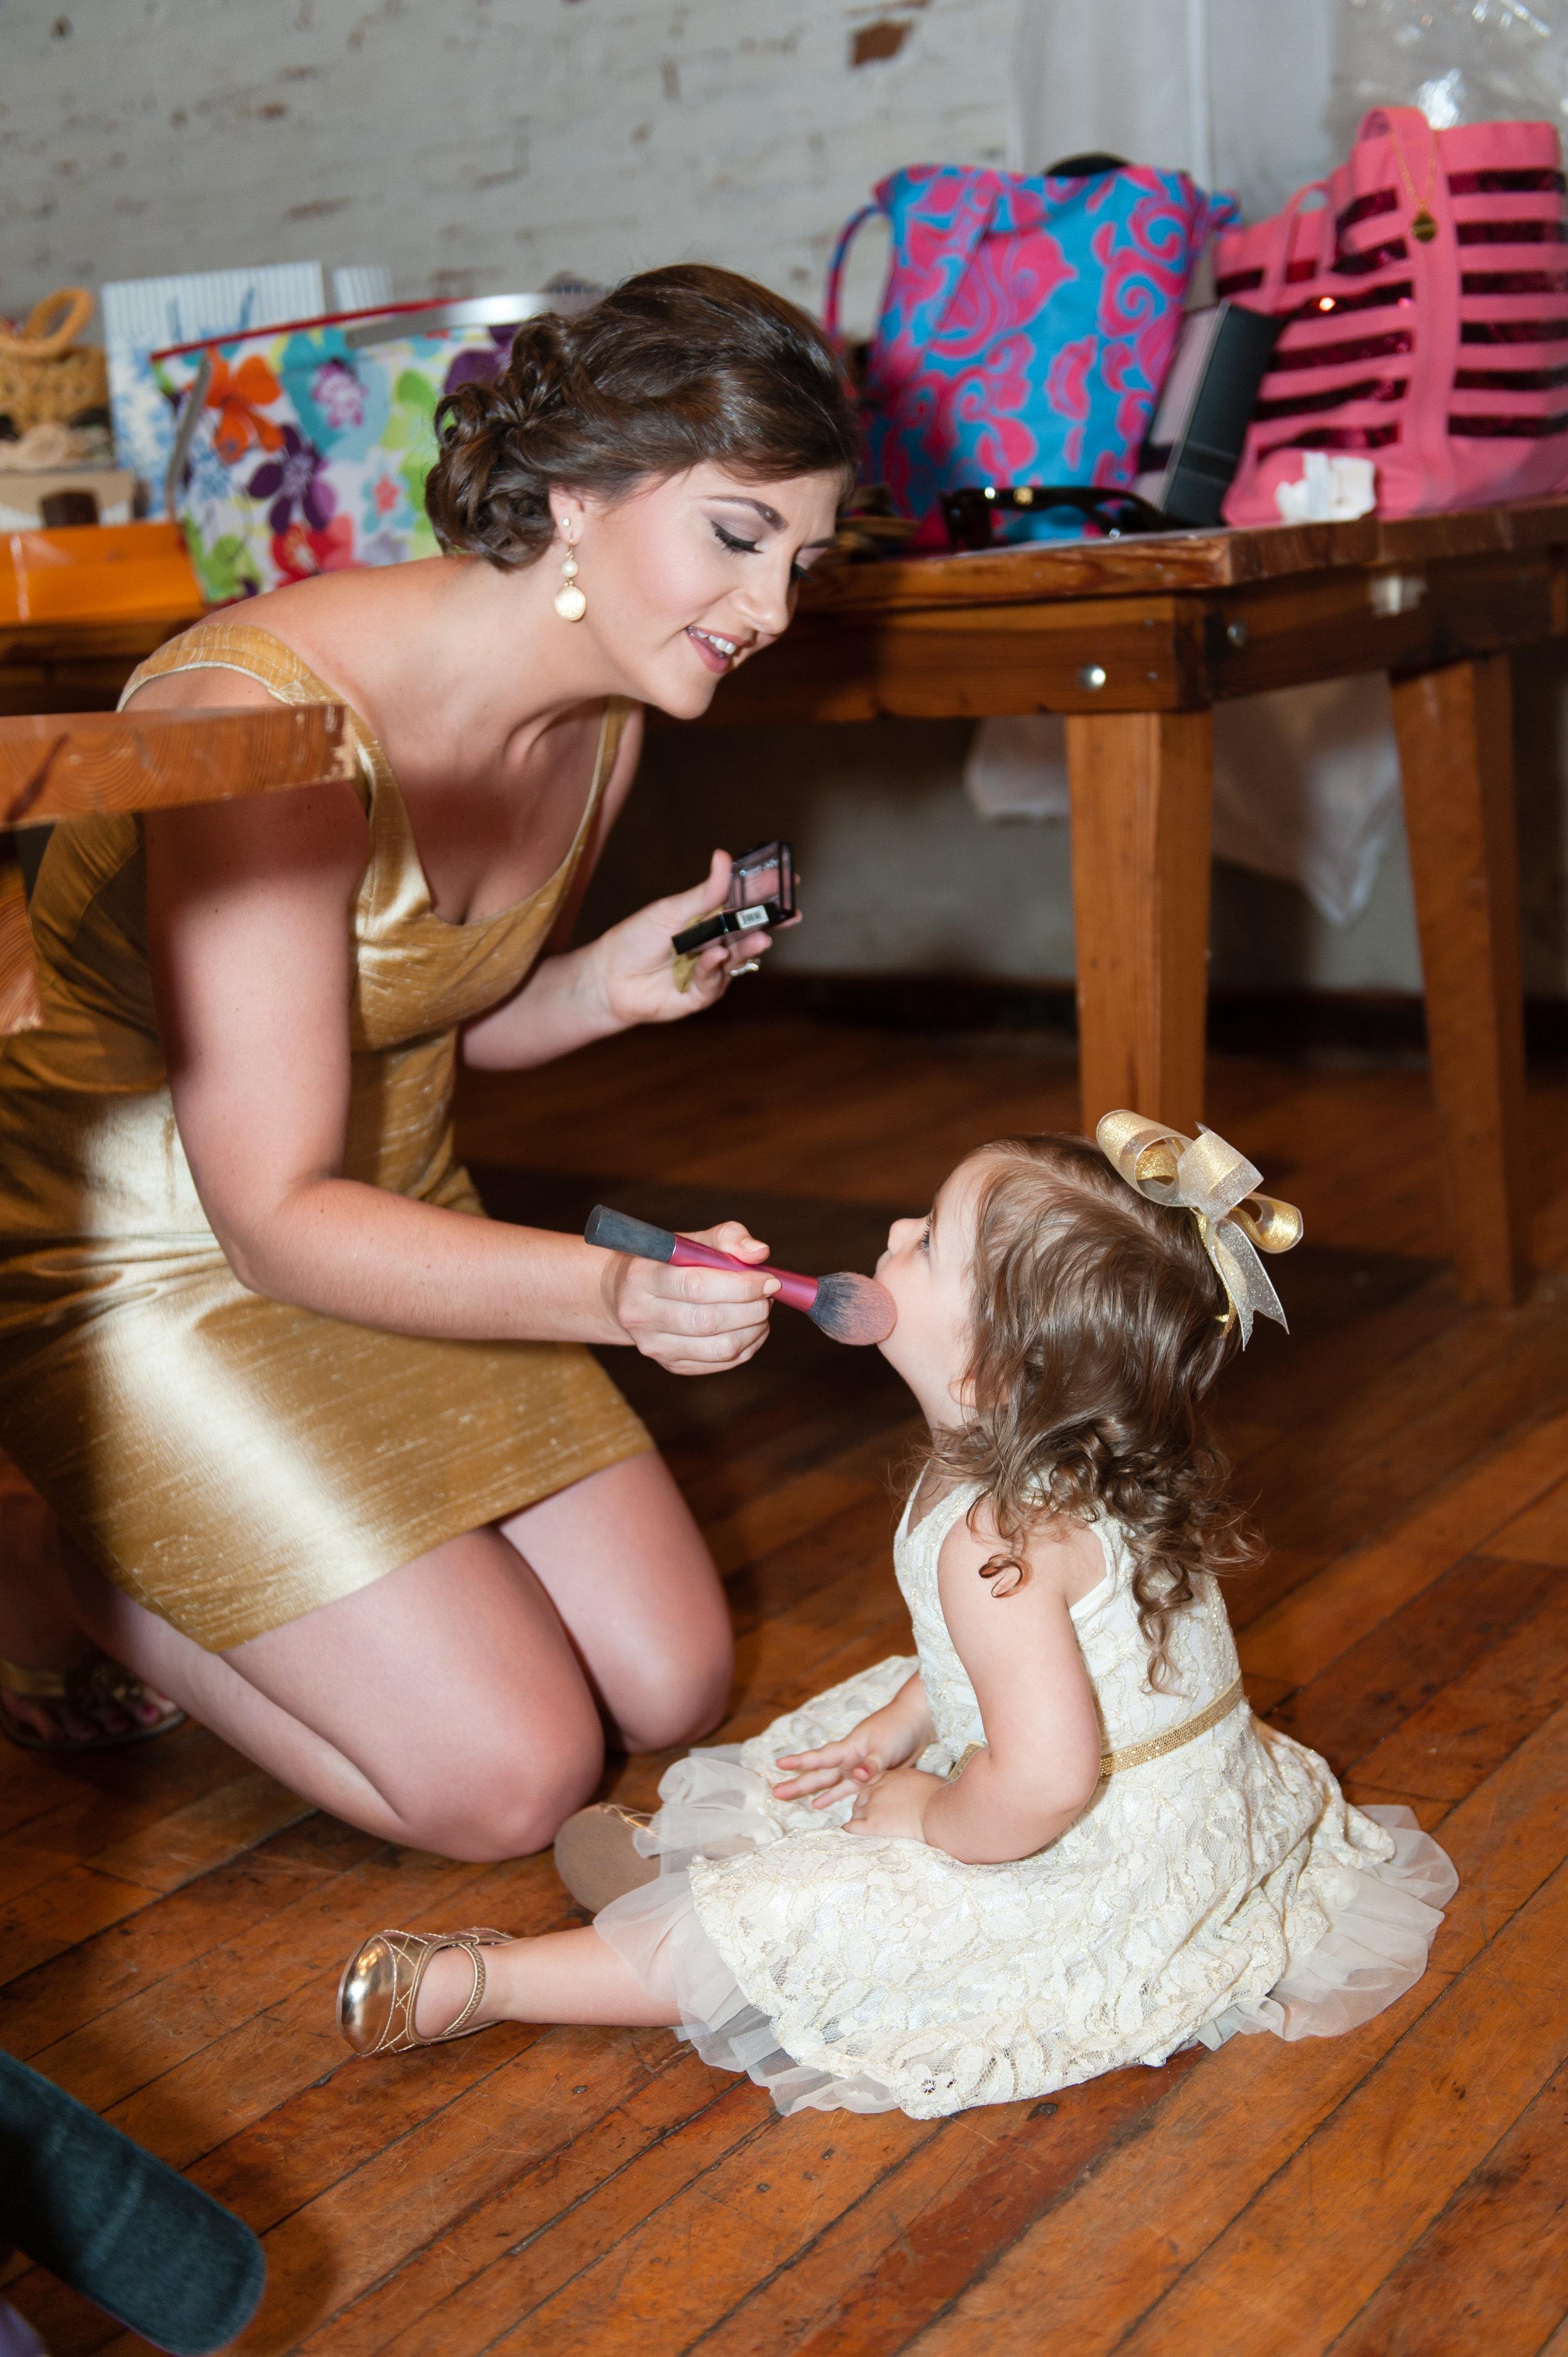 Baker Wedding - June 2014 -Beth York Photography